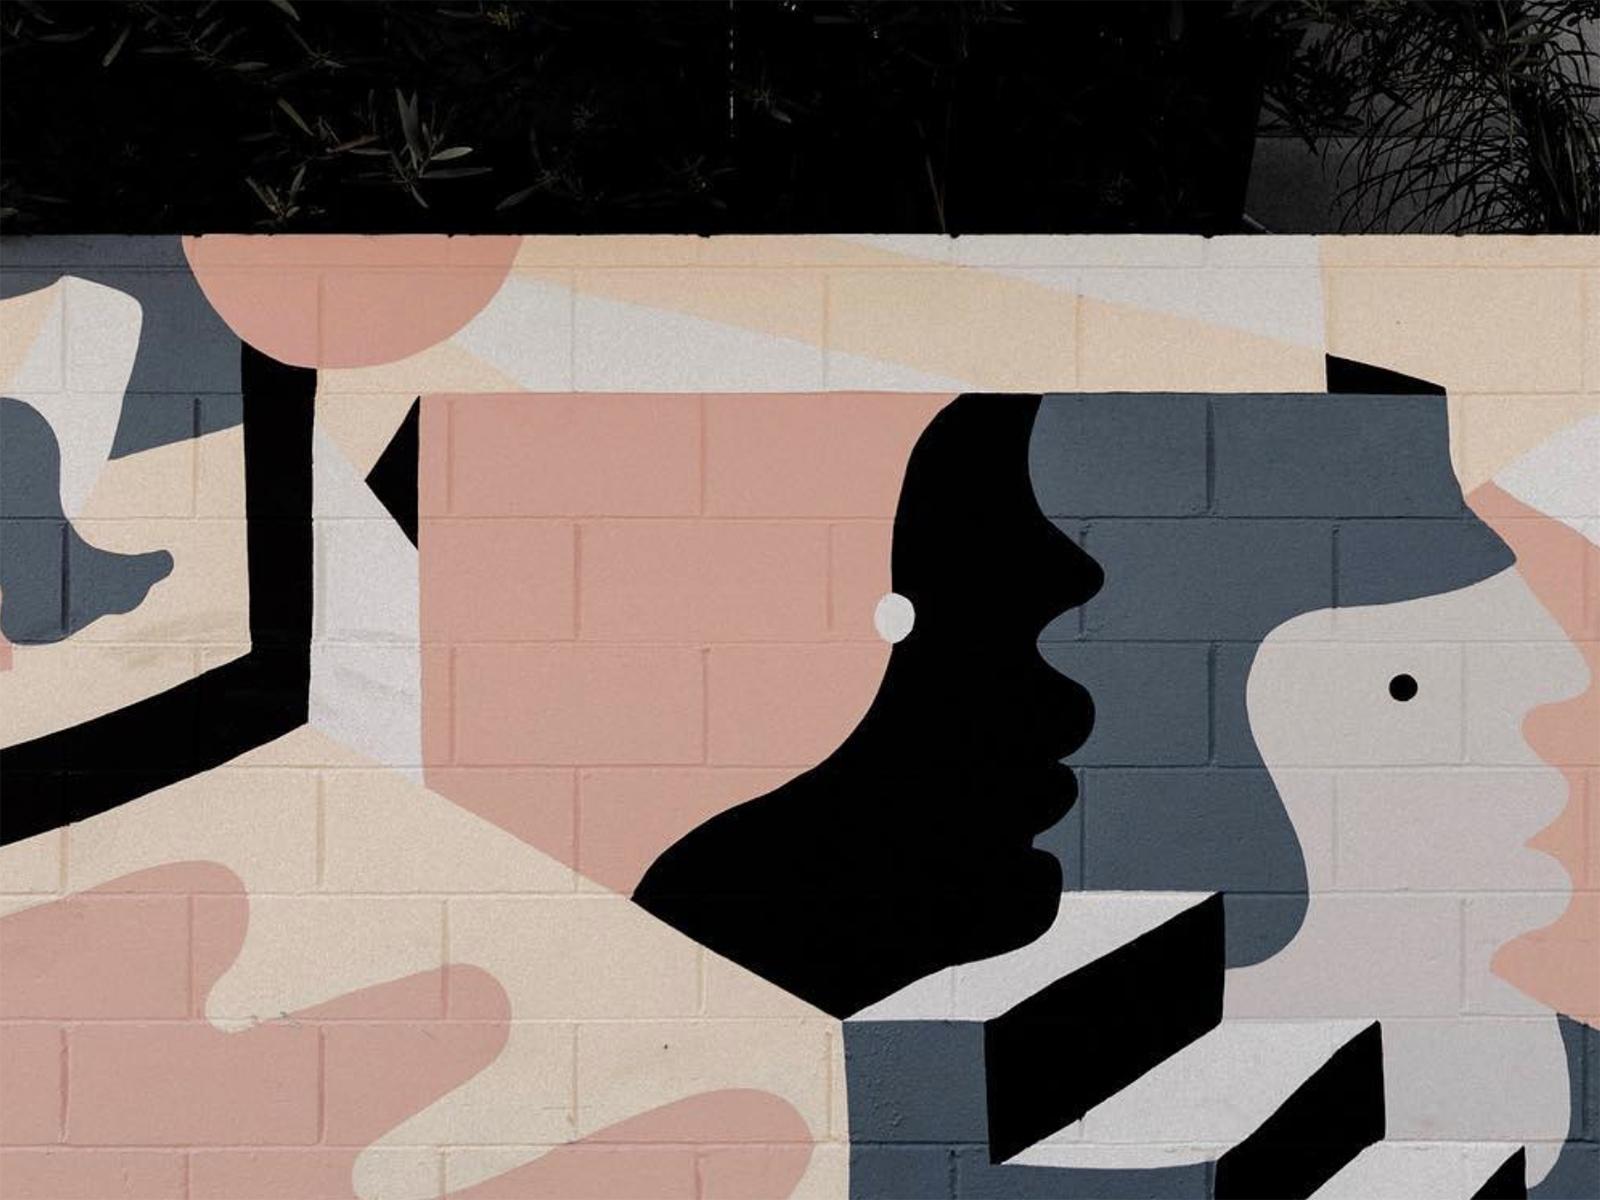 Hunker Mural 2019, Venice California